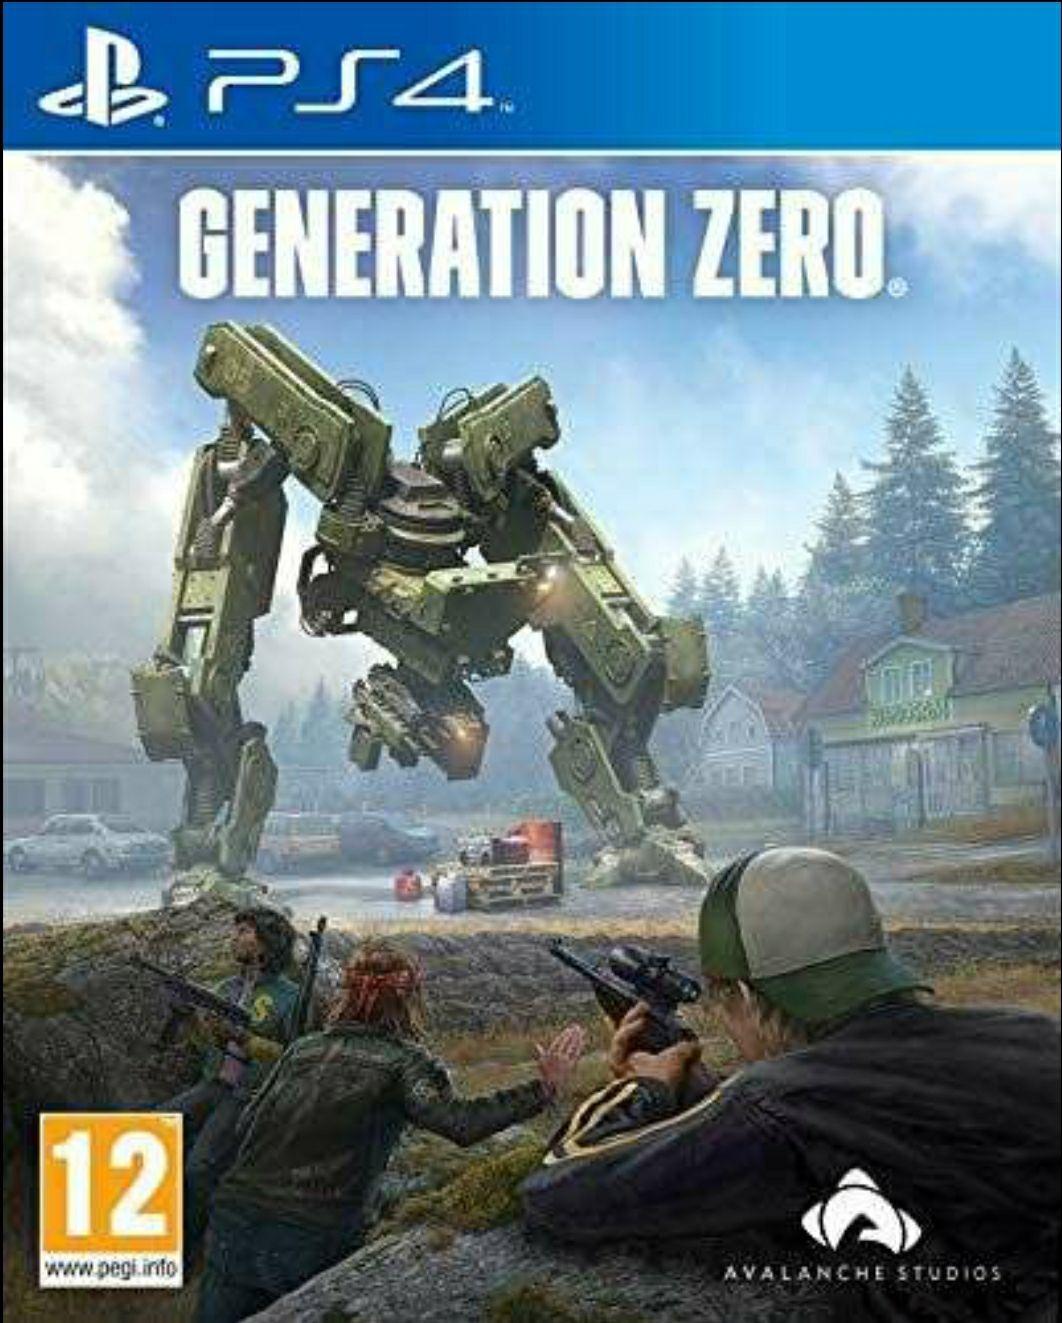 Generation Zero PS4 Standard Edition